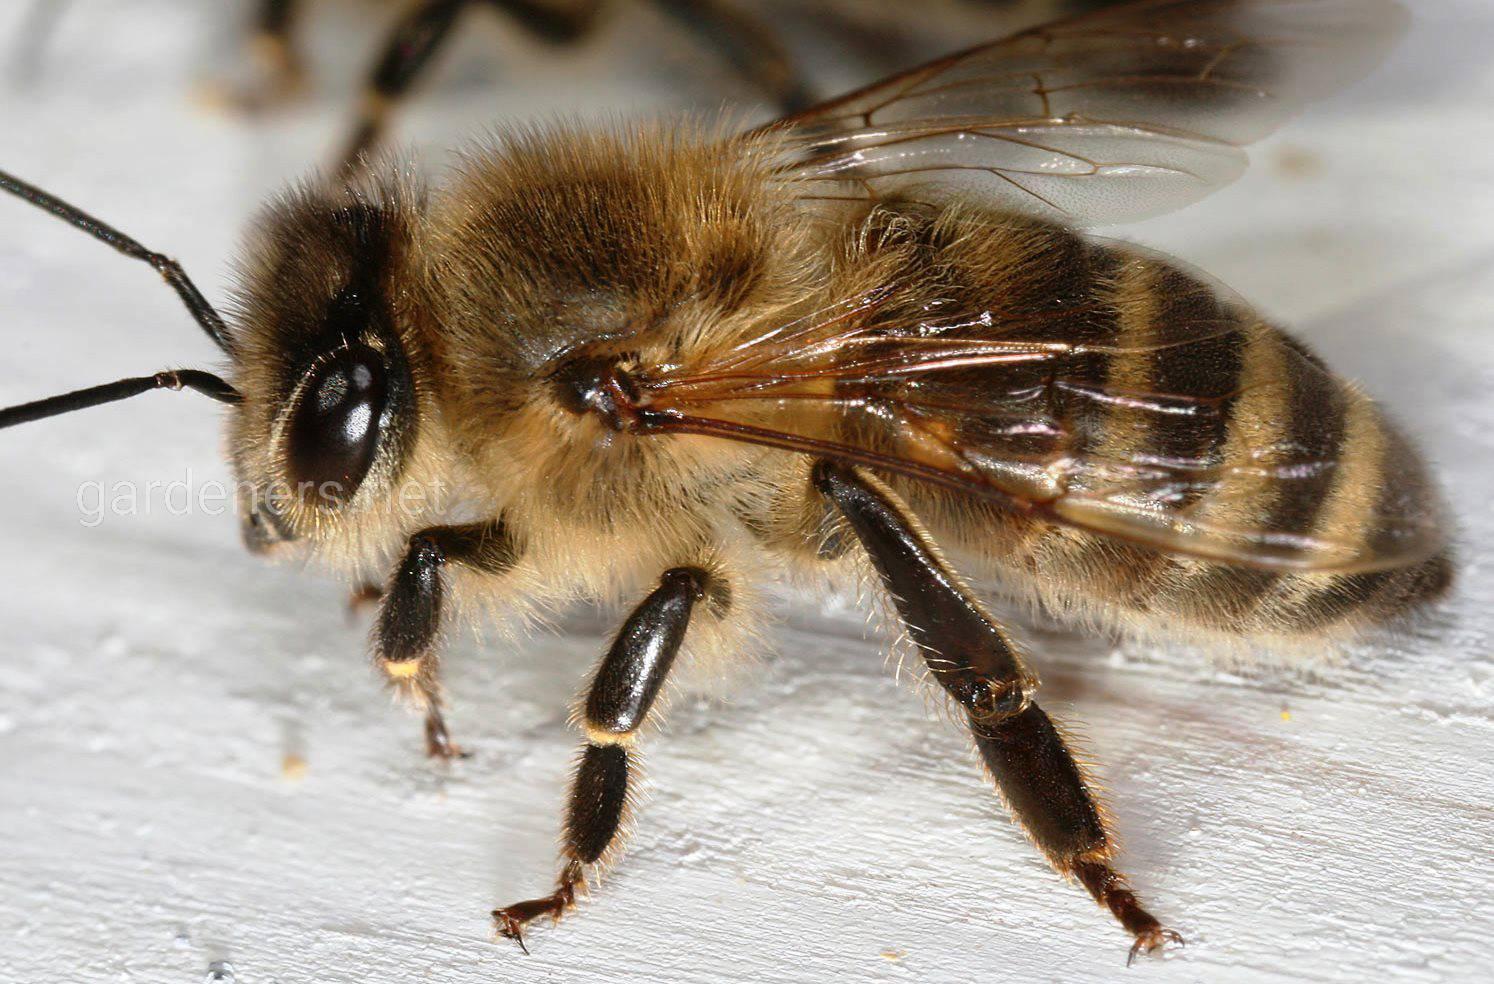 Краинская пчела.jpg